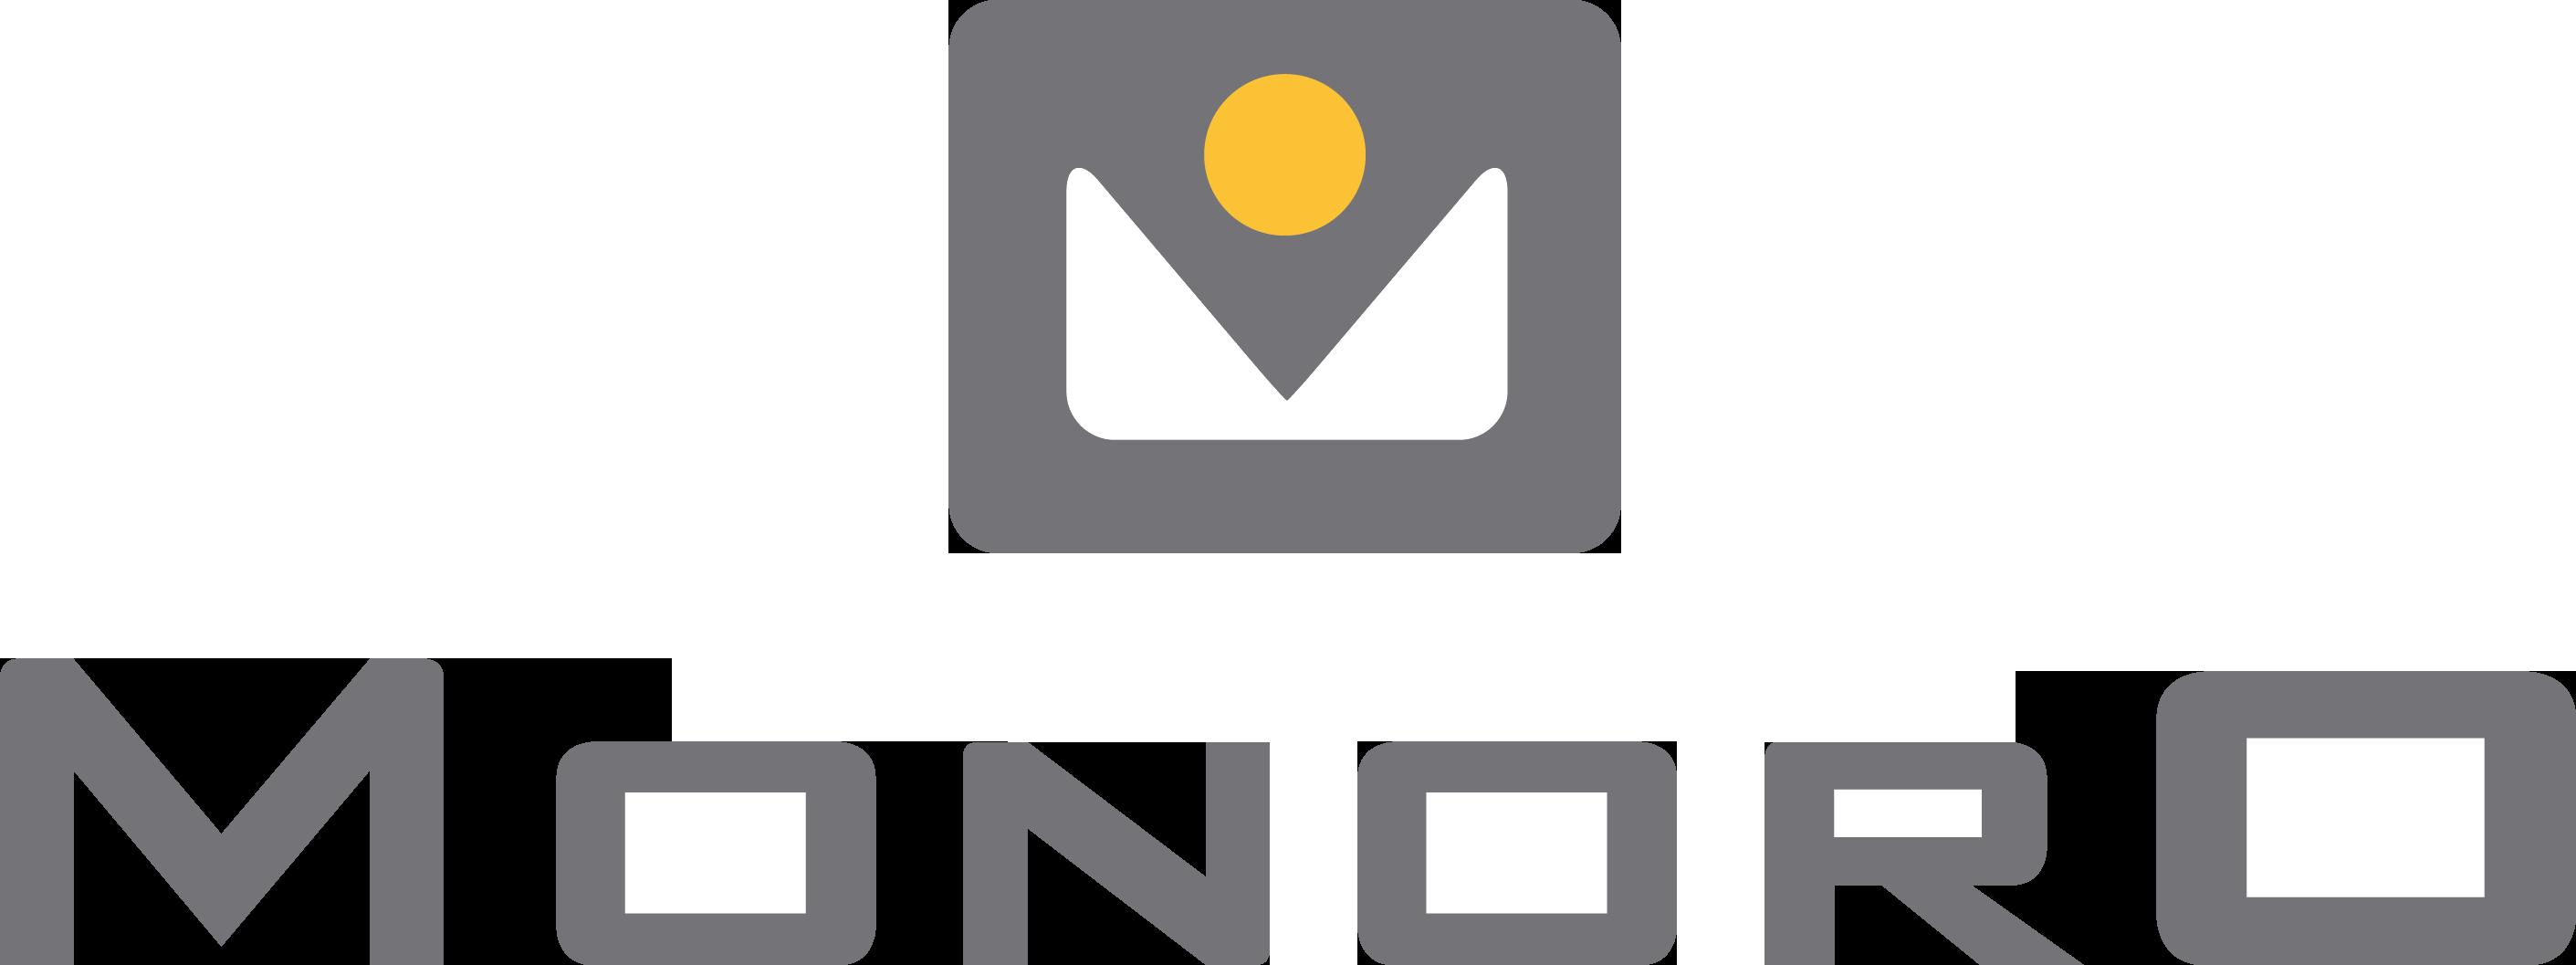 MONORO(株式会社 モノーロ)